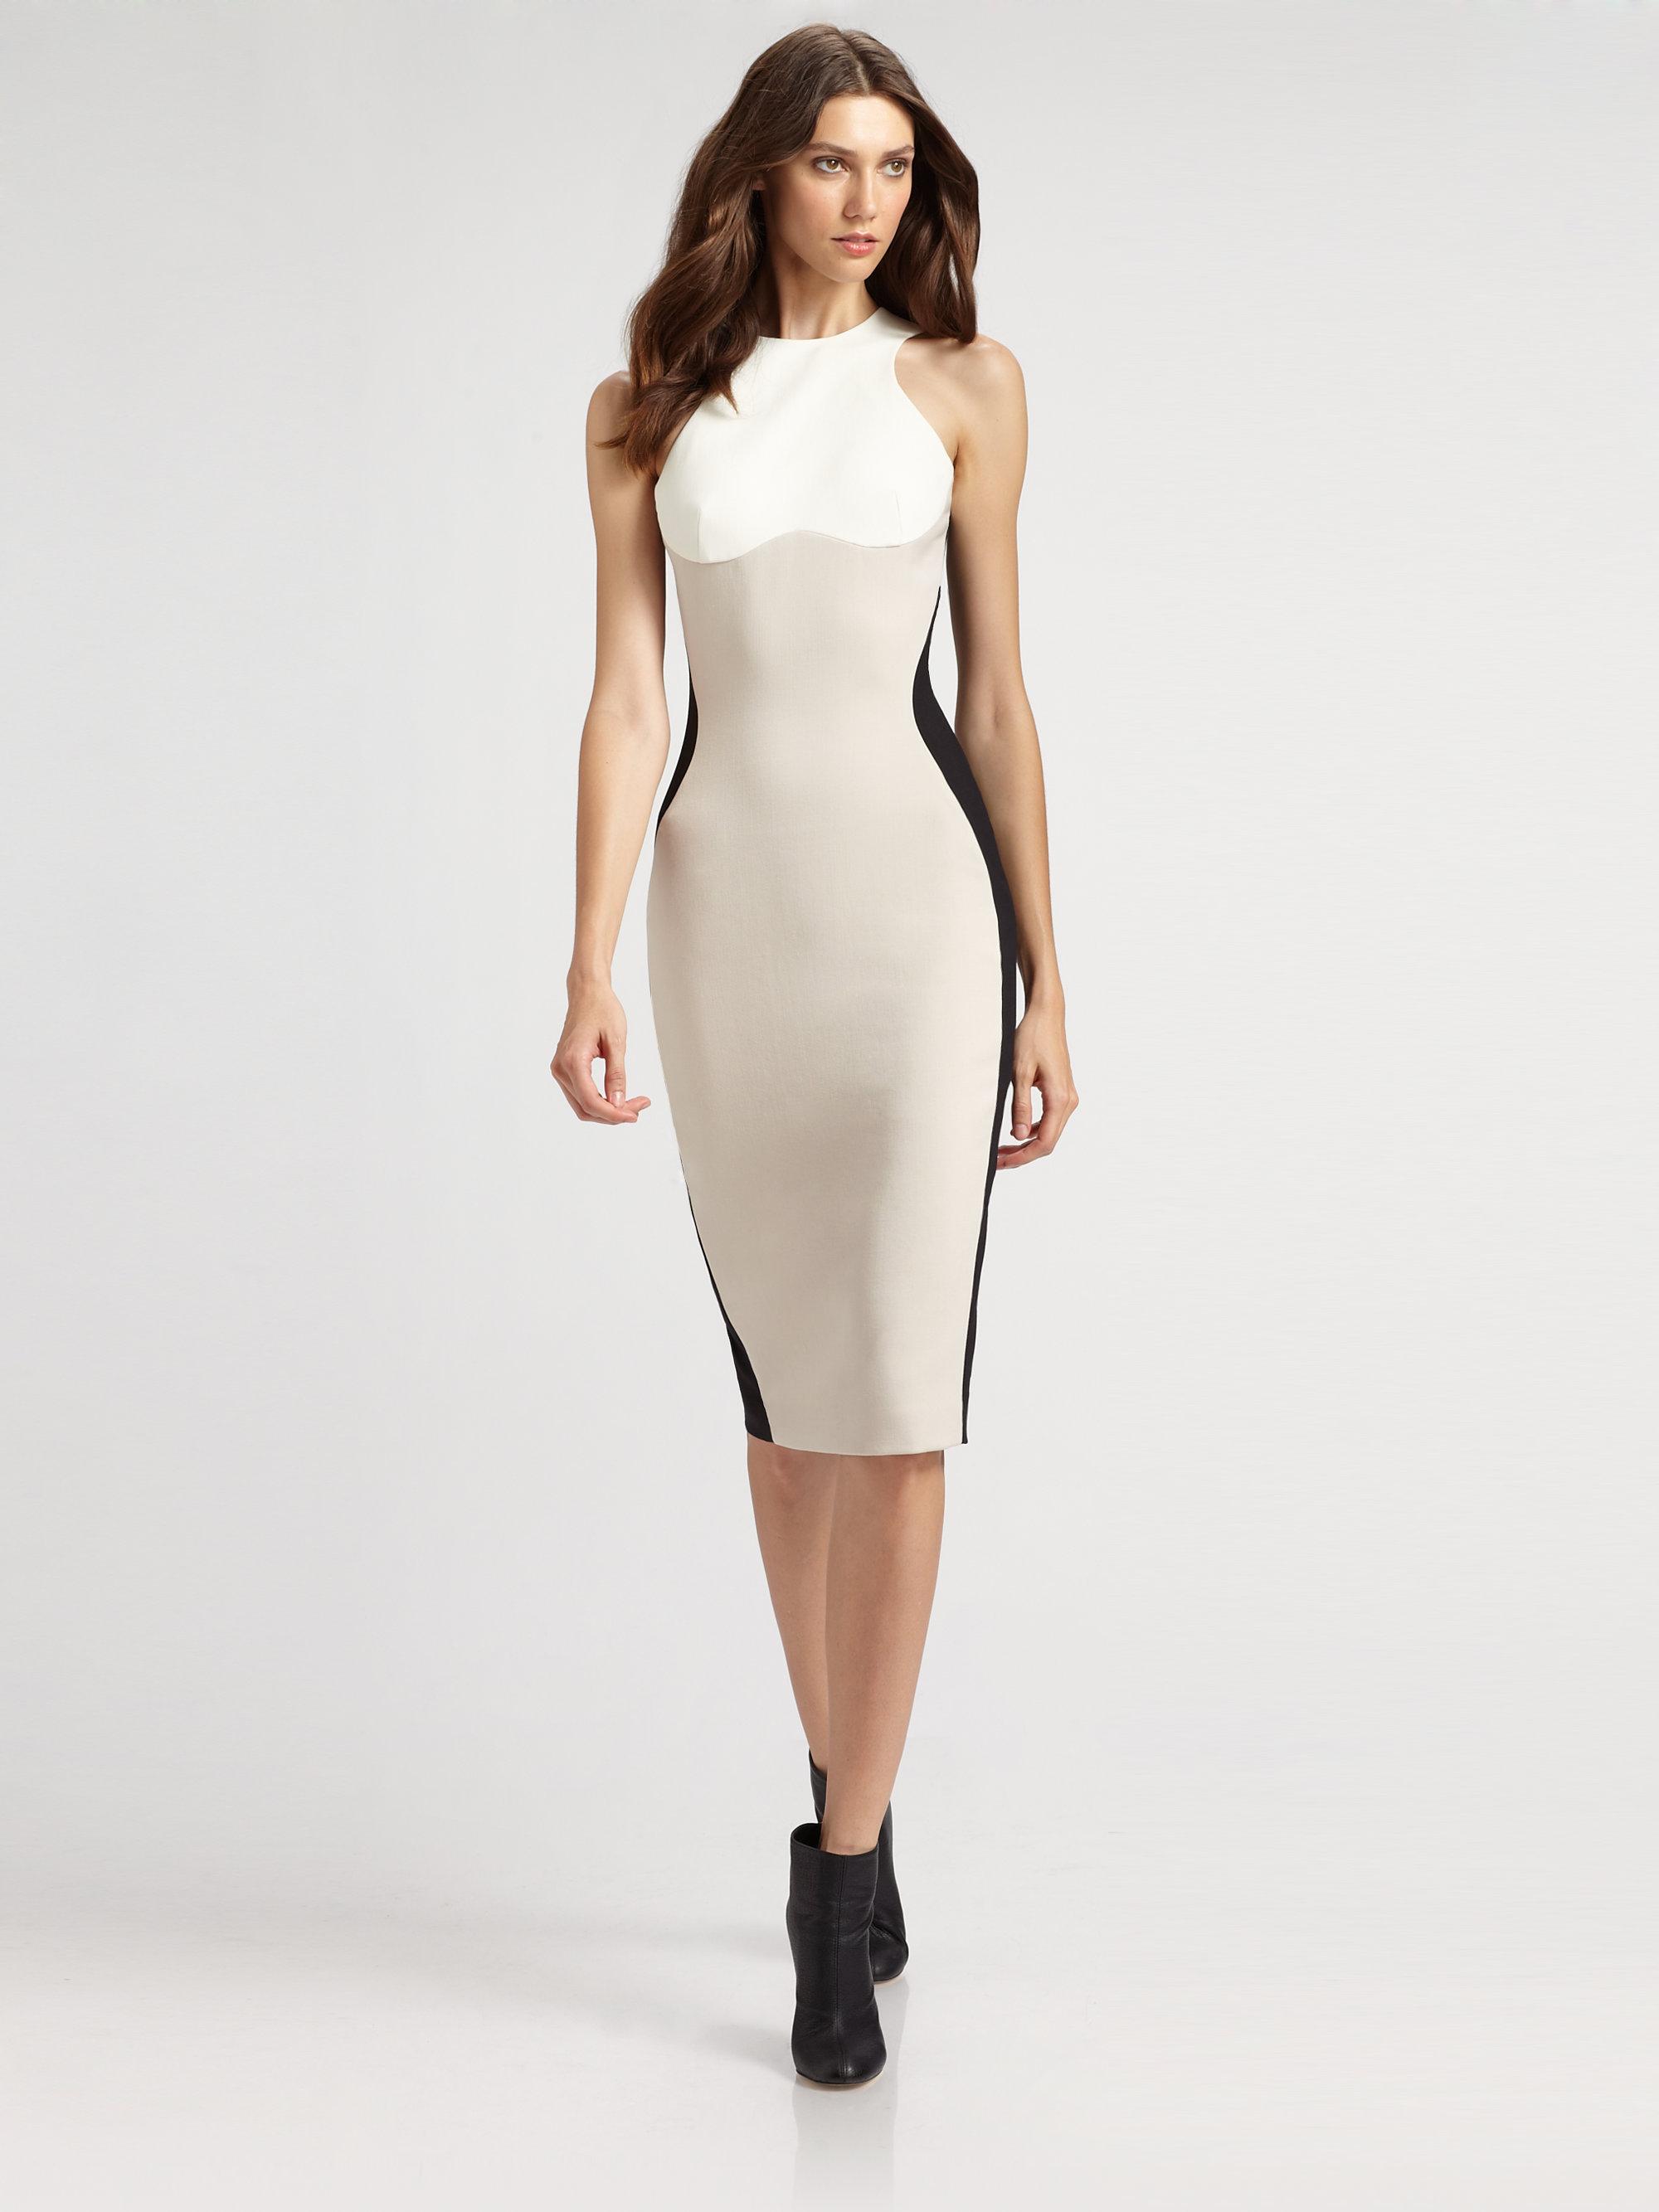 Lyst - Stella Mccartney Colorblock Dress in White